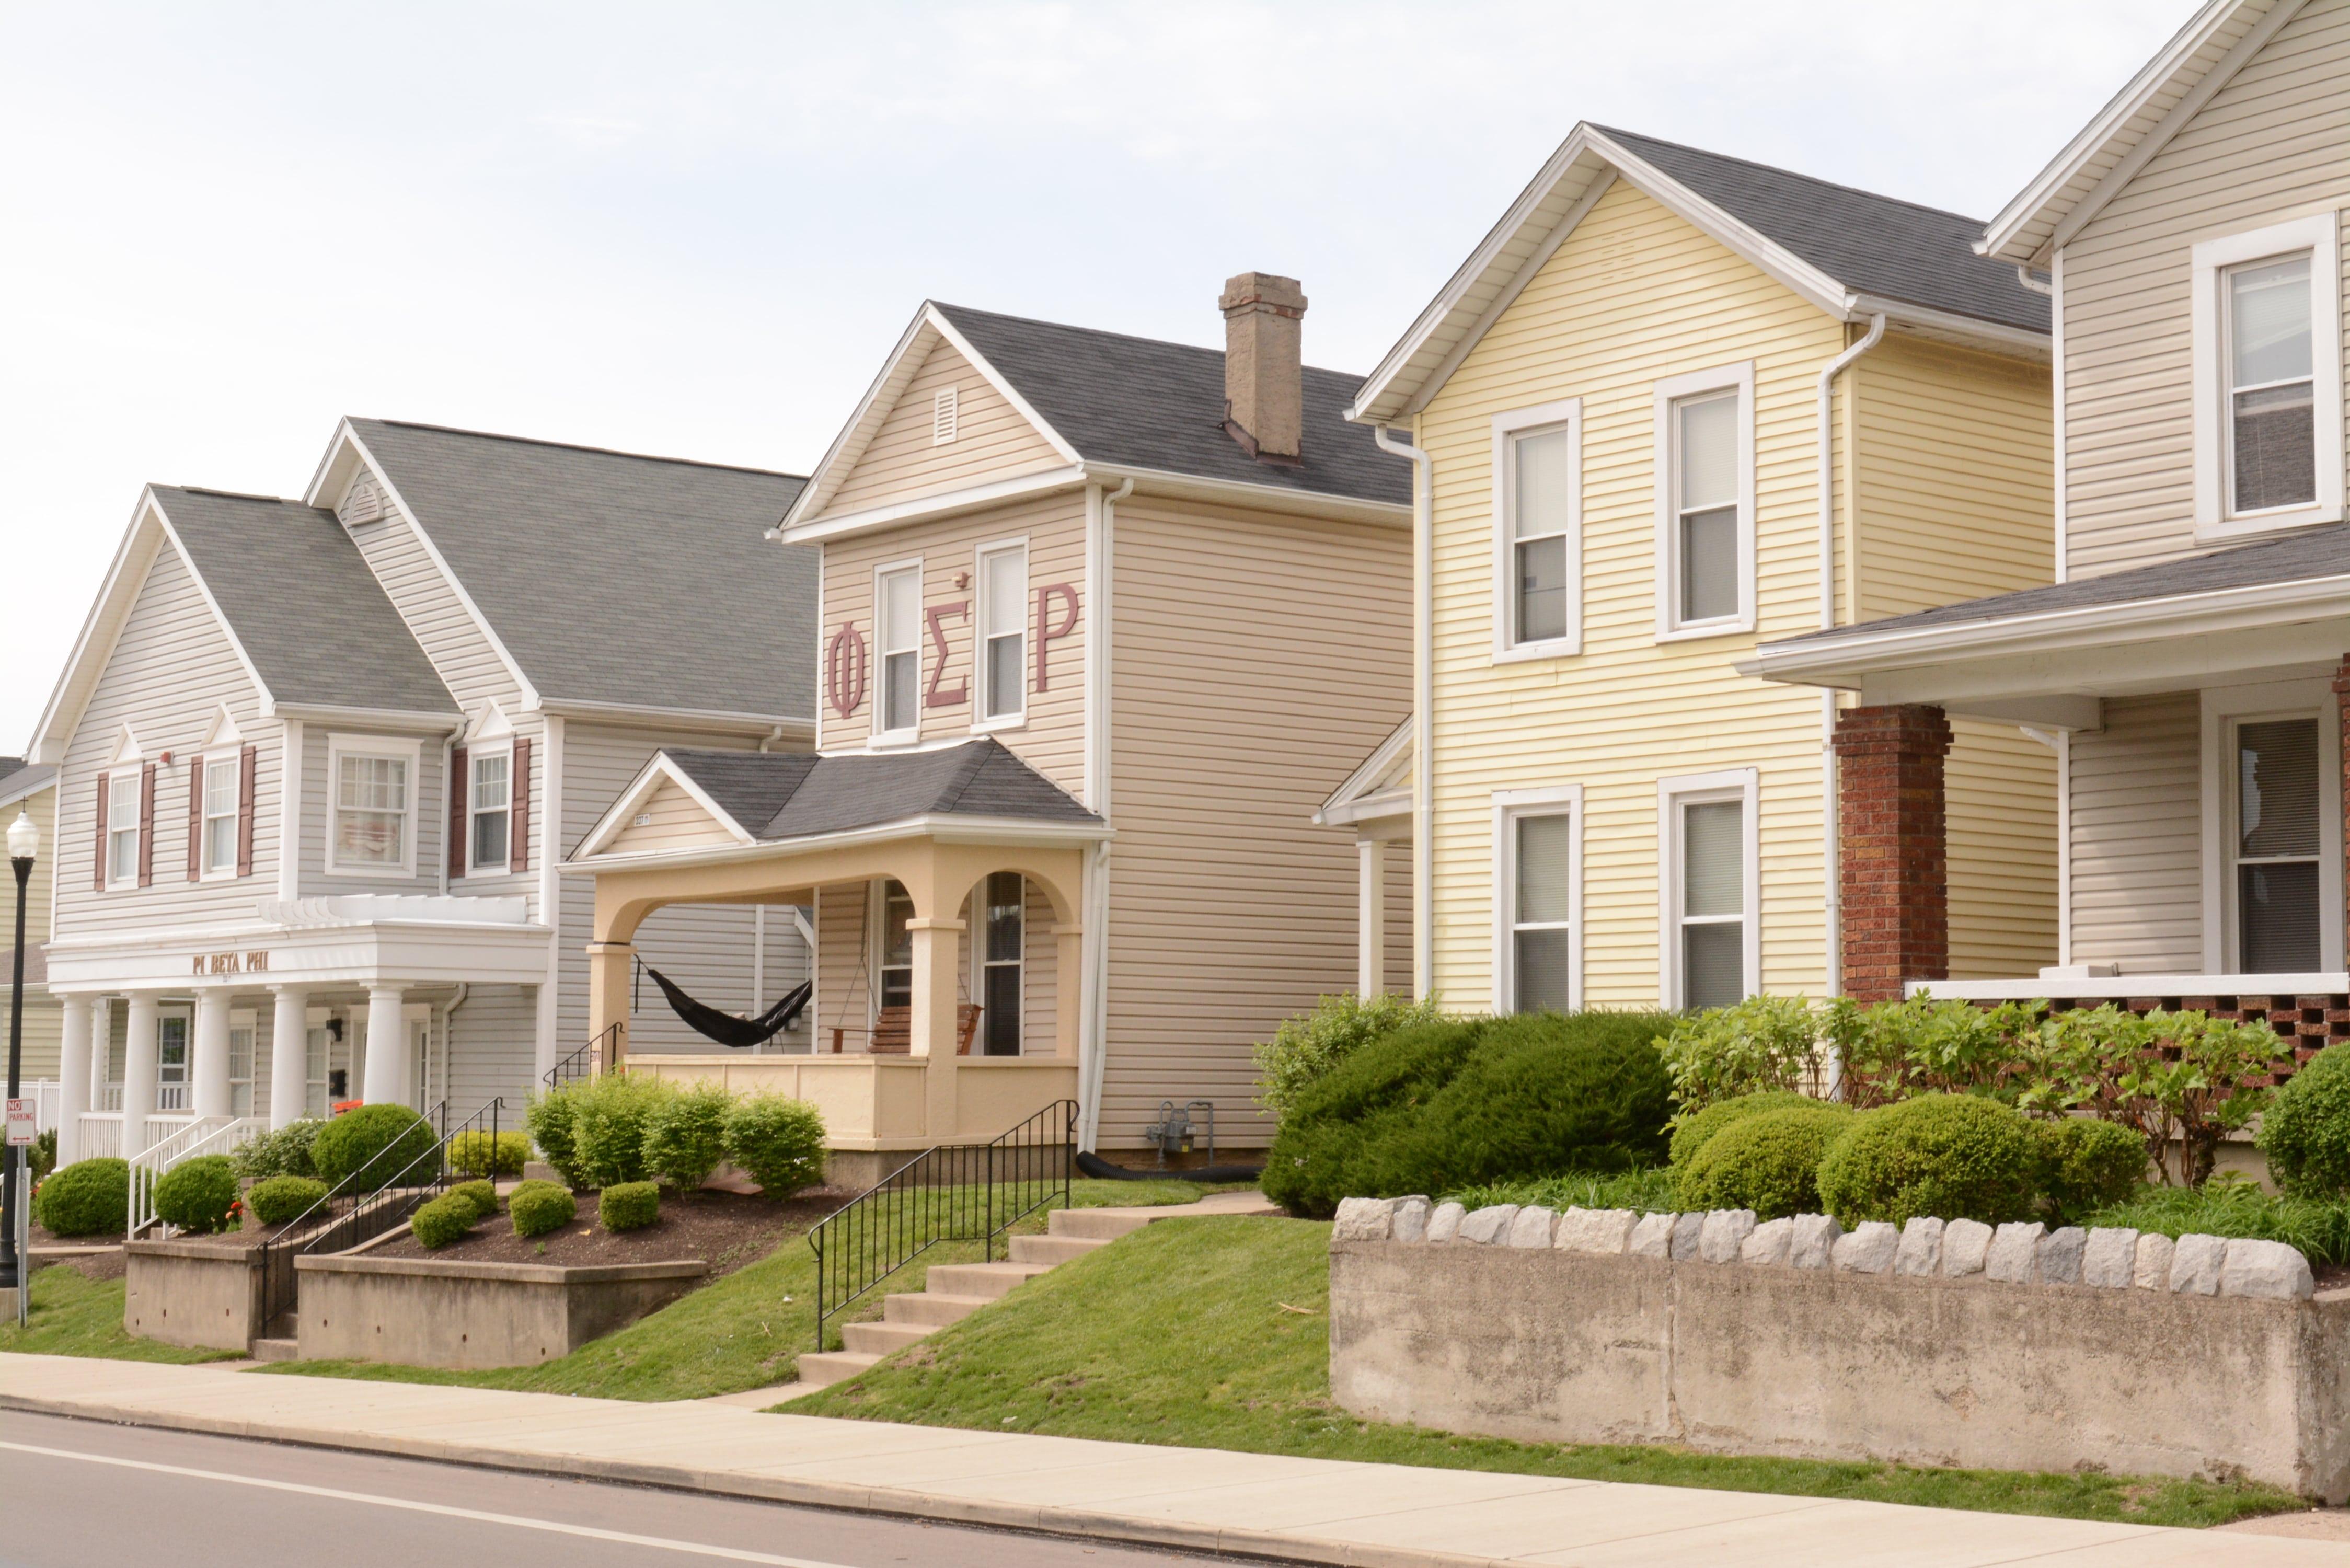 Incredible Upperdivision Housing University Of Dayton Ohio Download Free Architecture Designs Scobabritishbridgeorg